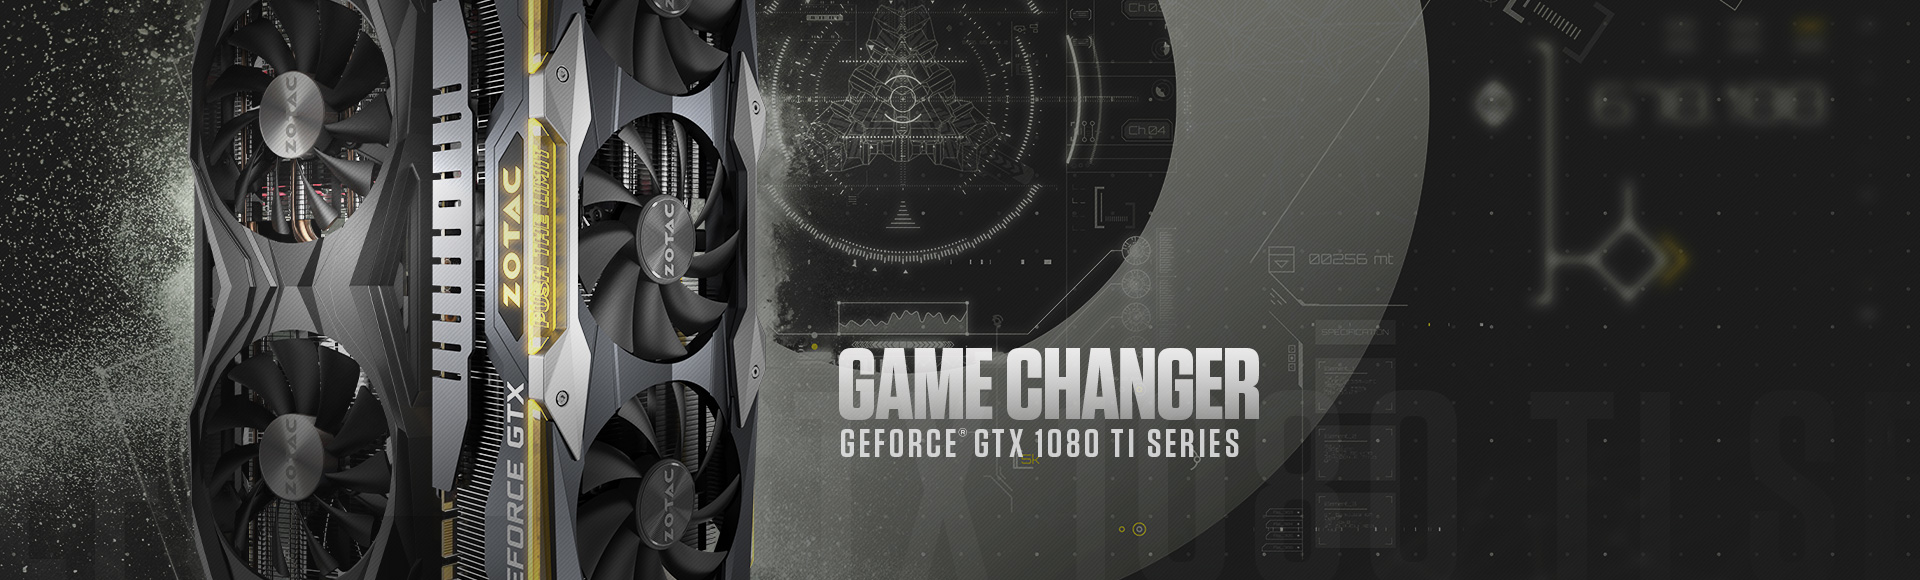 ZOTAC-GTX-1080-TI-Series